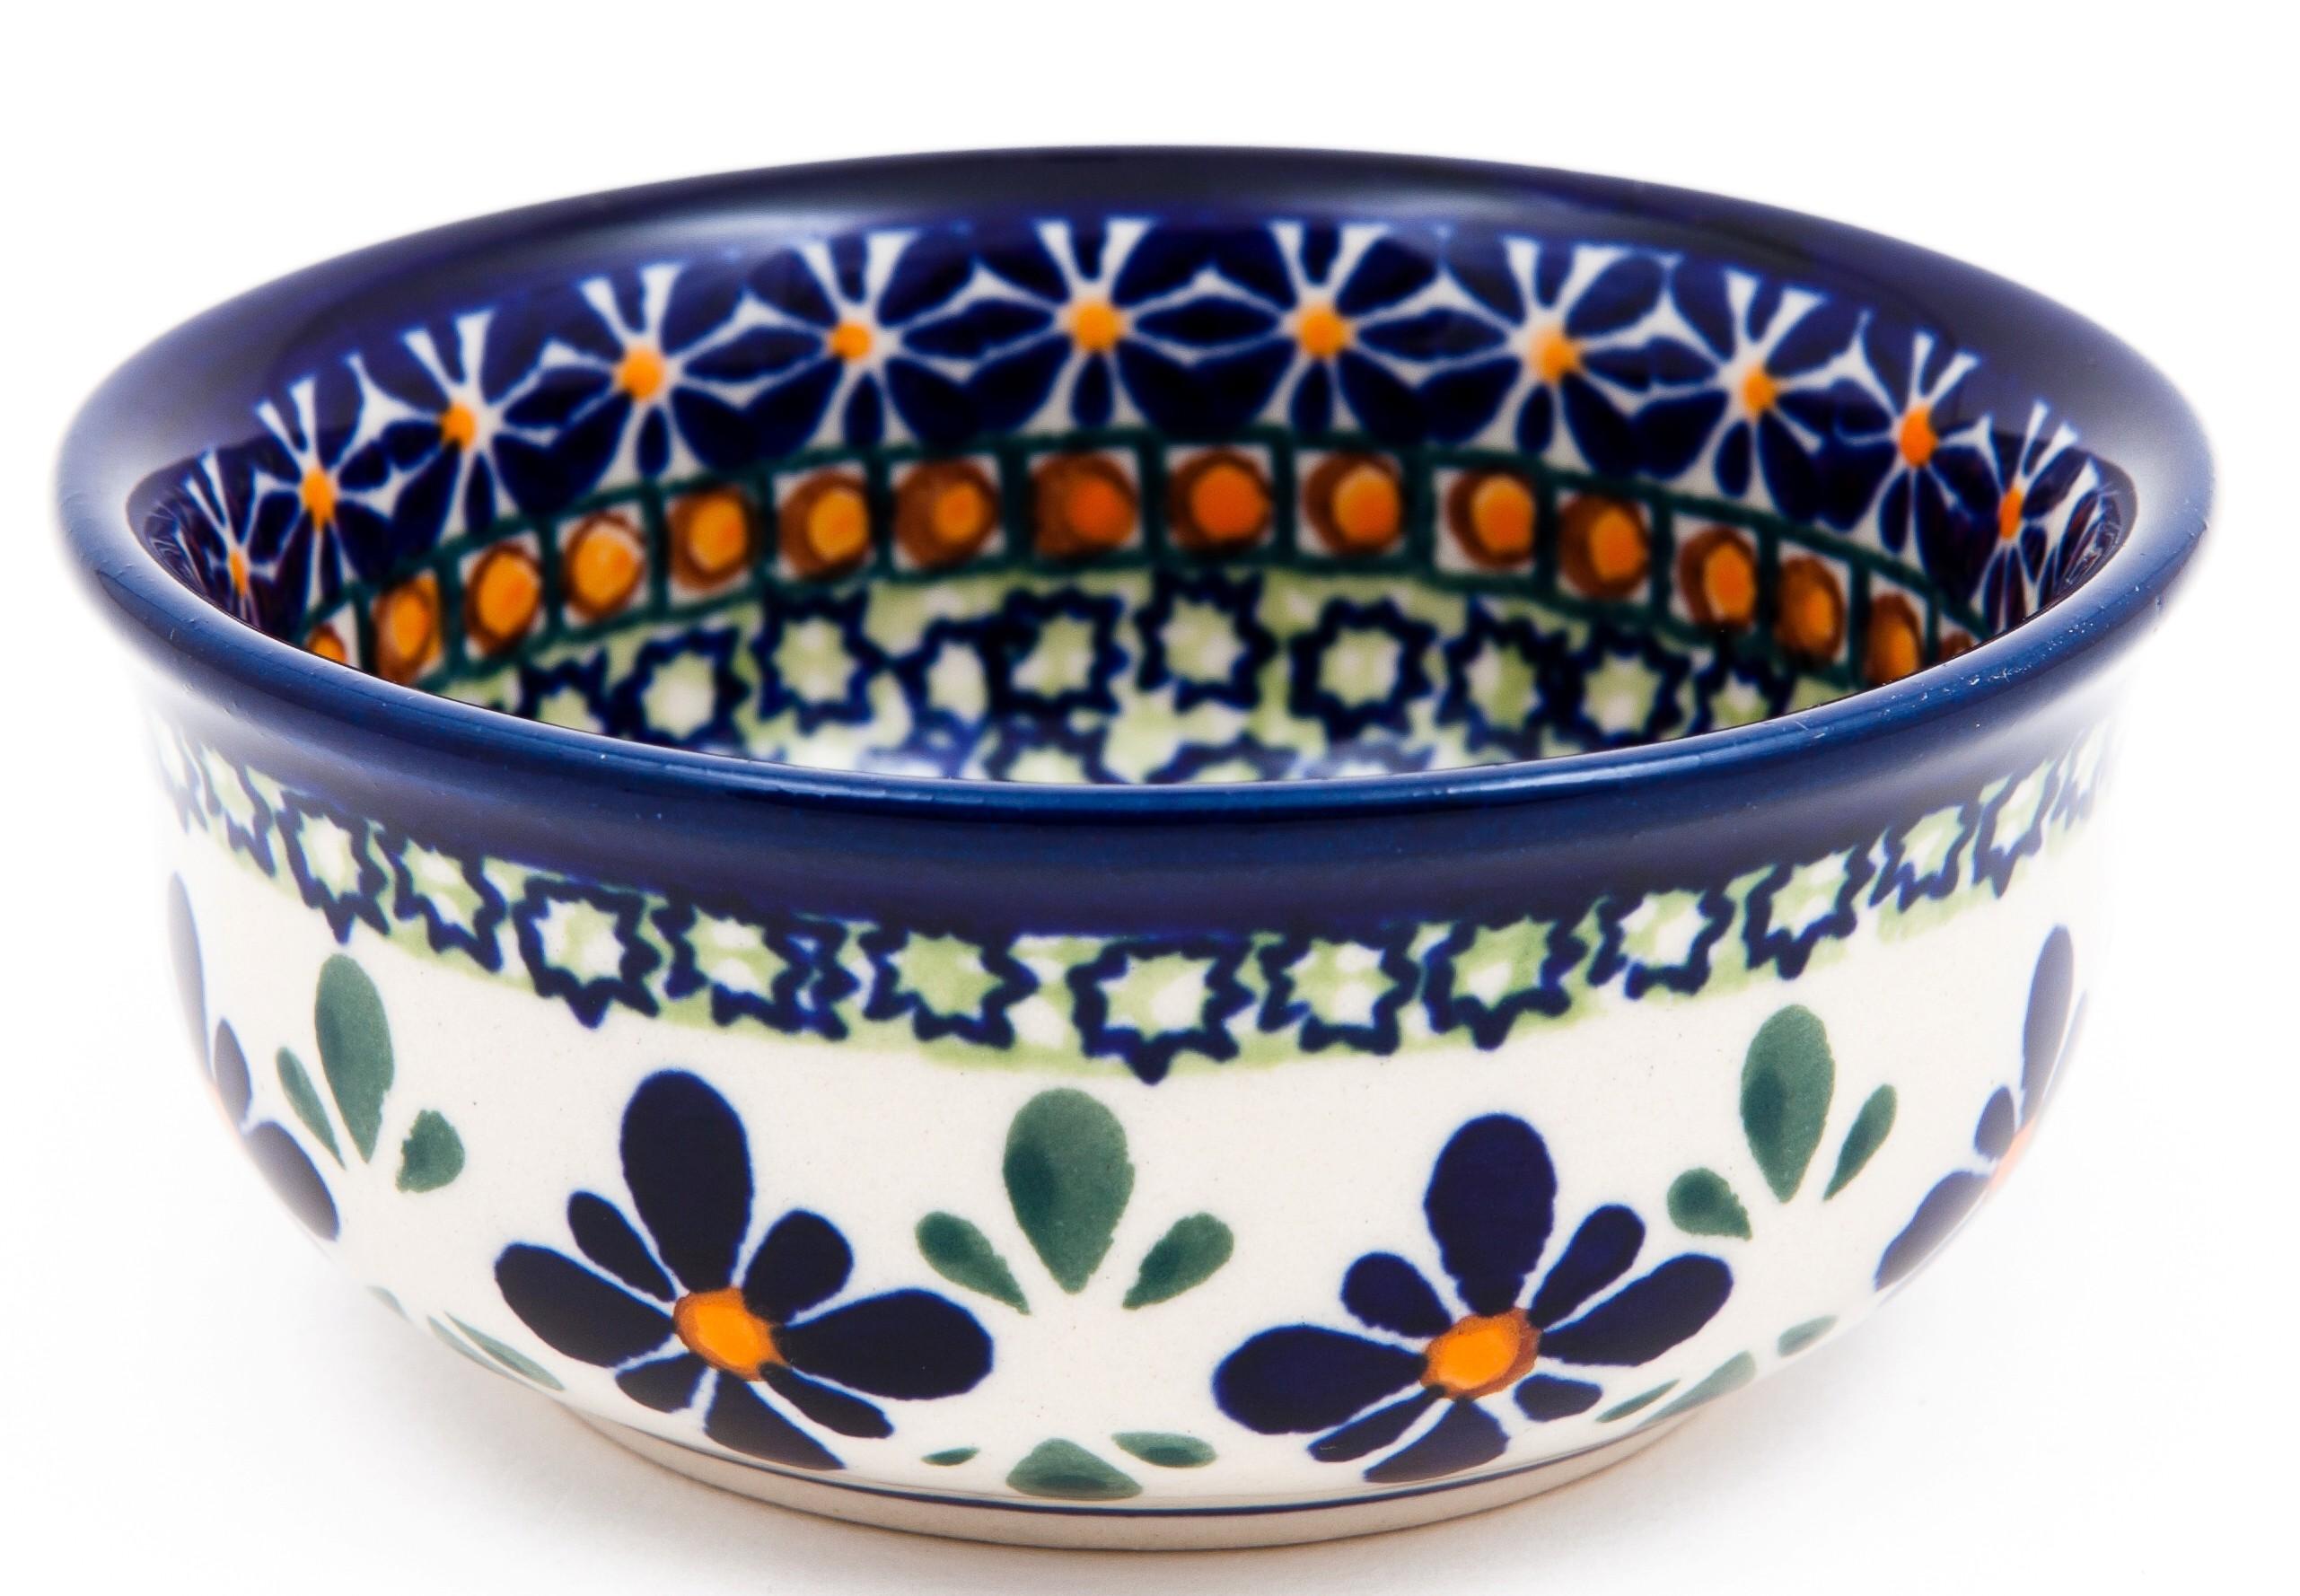 Pottery Avenue Small Stoneware Bowl - 1384-DU60 Sweetie Pie